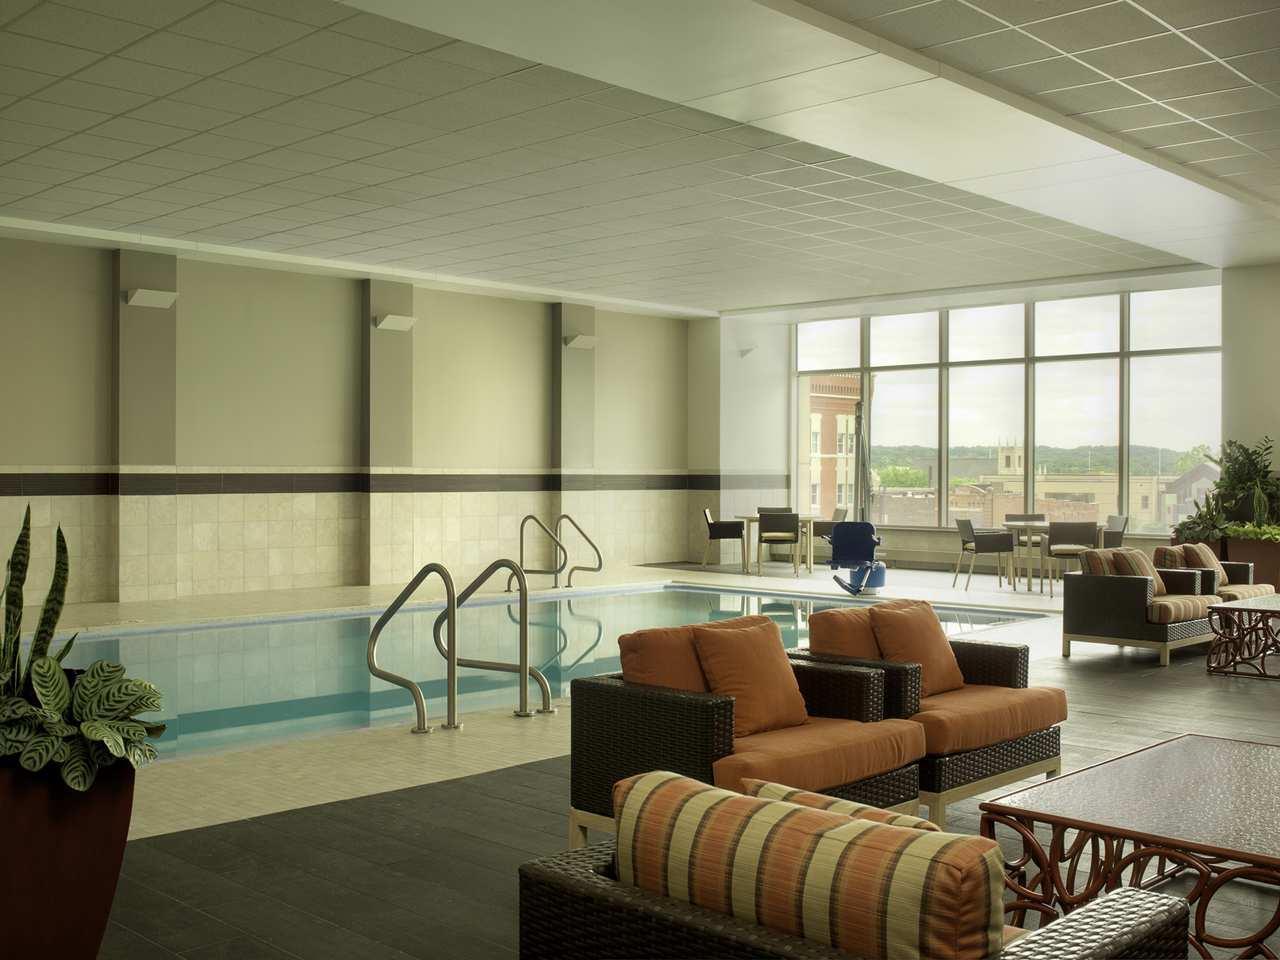 DoubleTree by Hilton Hotel Cedar Rapids Convention Complex image 4